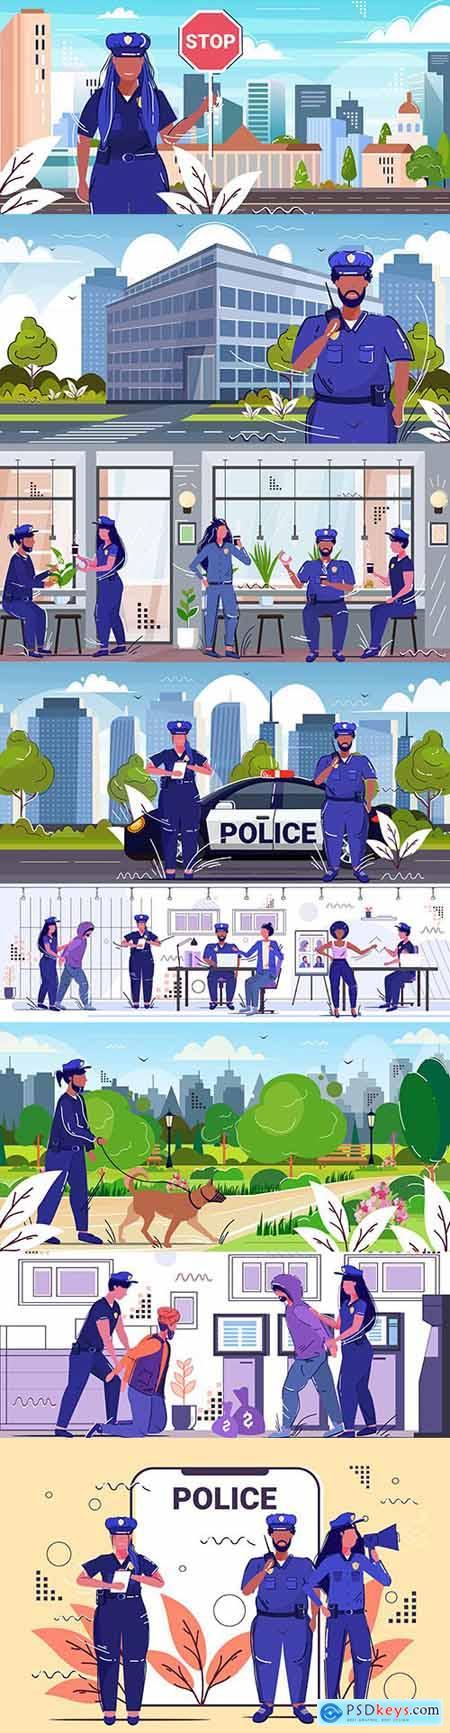 Policeman and criminal cityscape concept security